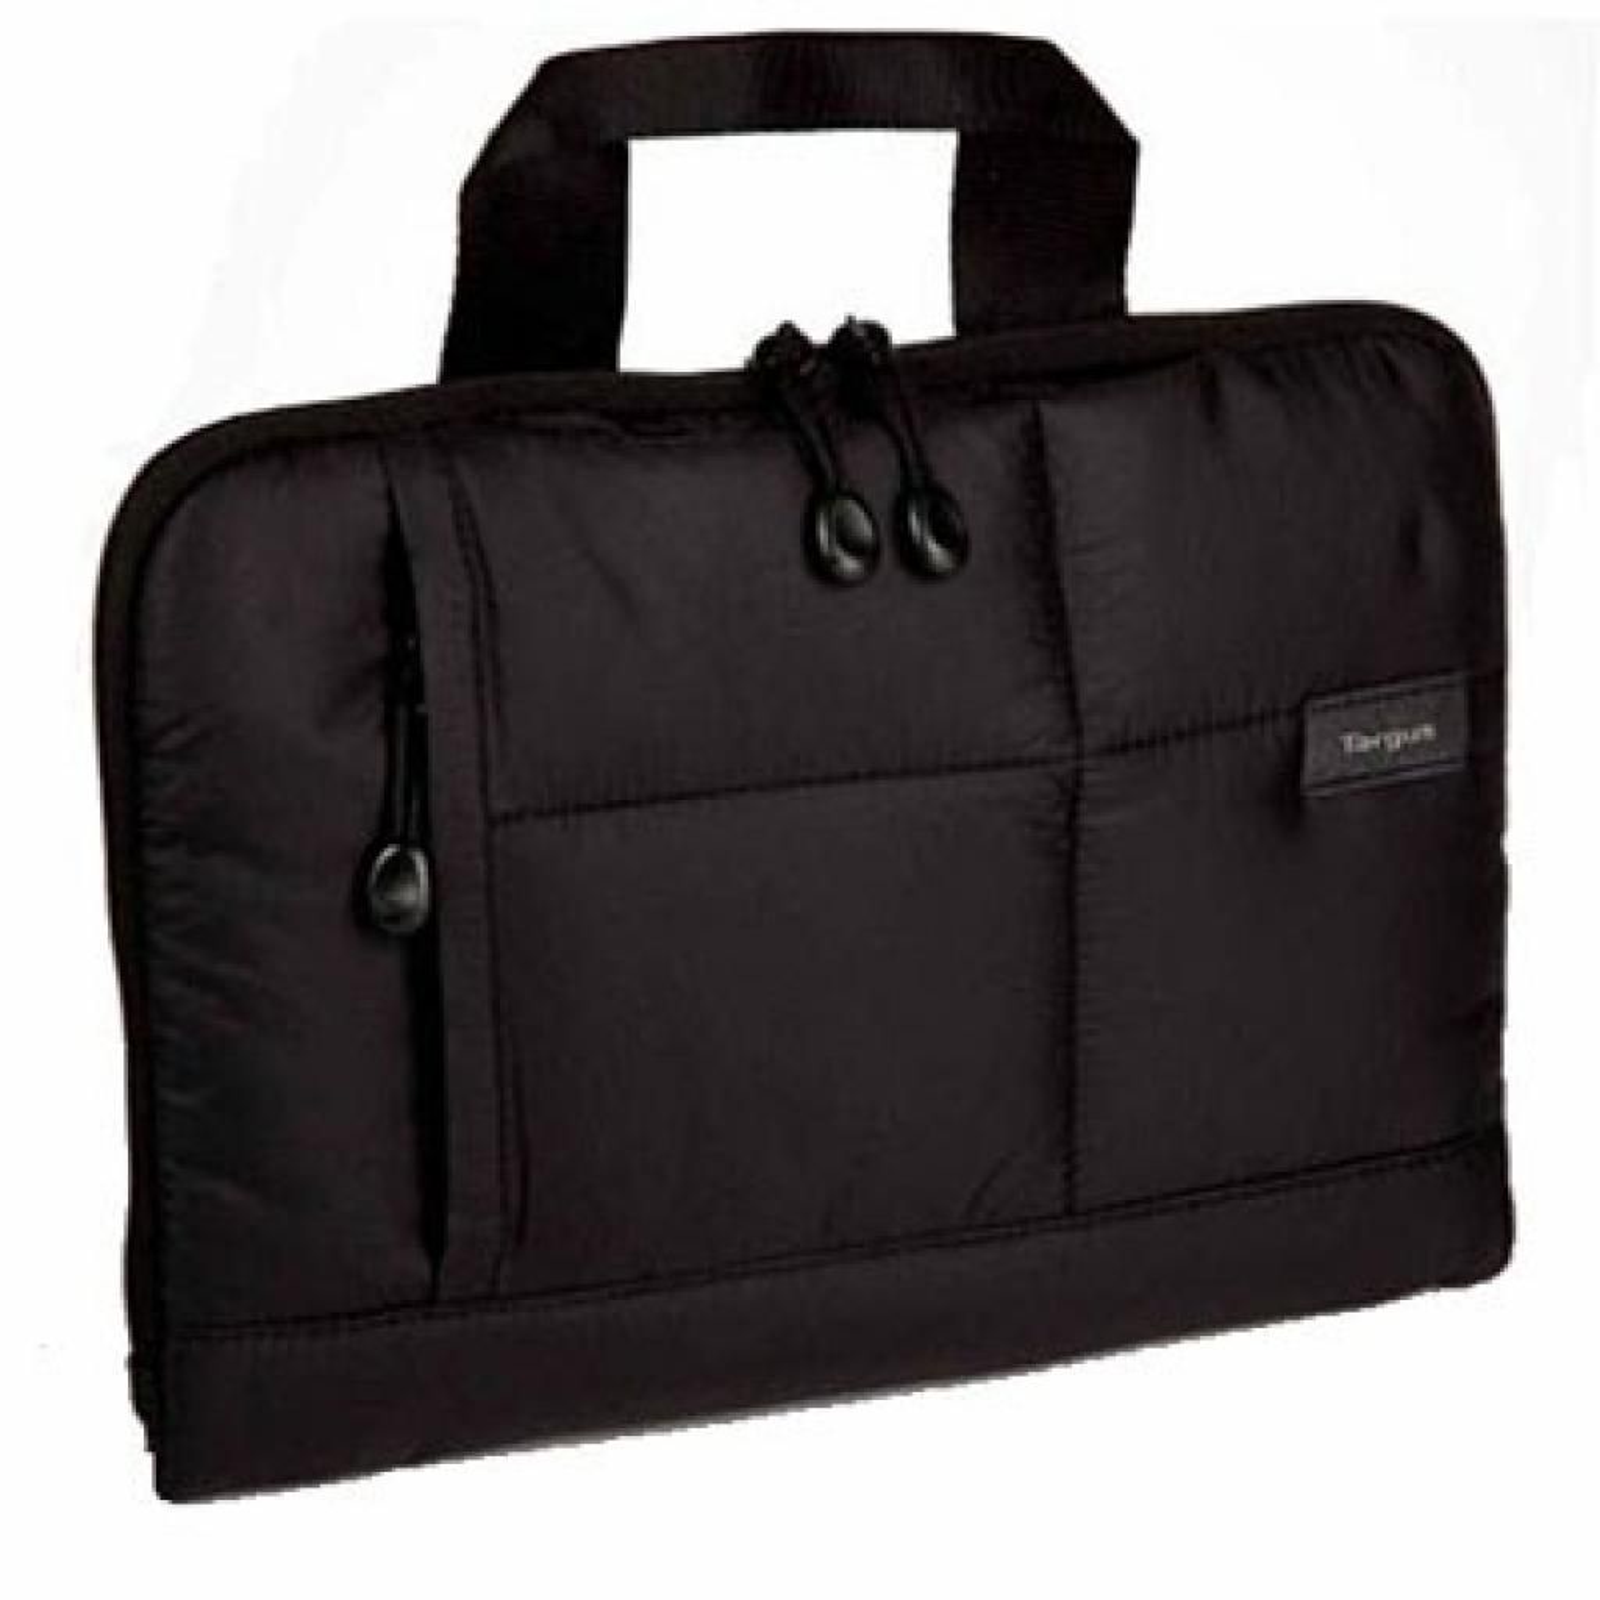 "Чехол для планшета Targus 9.7"" Universal bag (TSS177EU)"